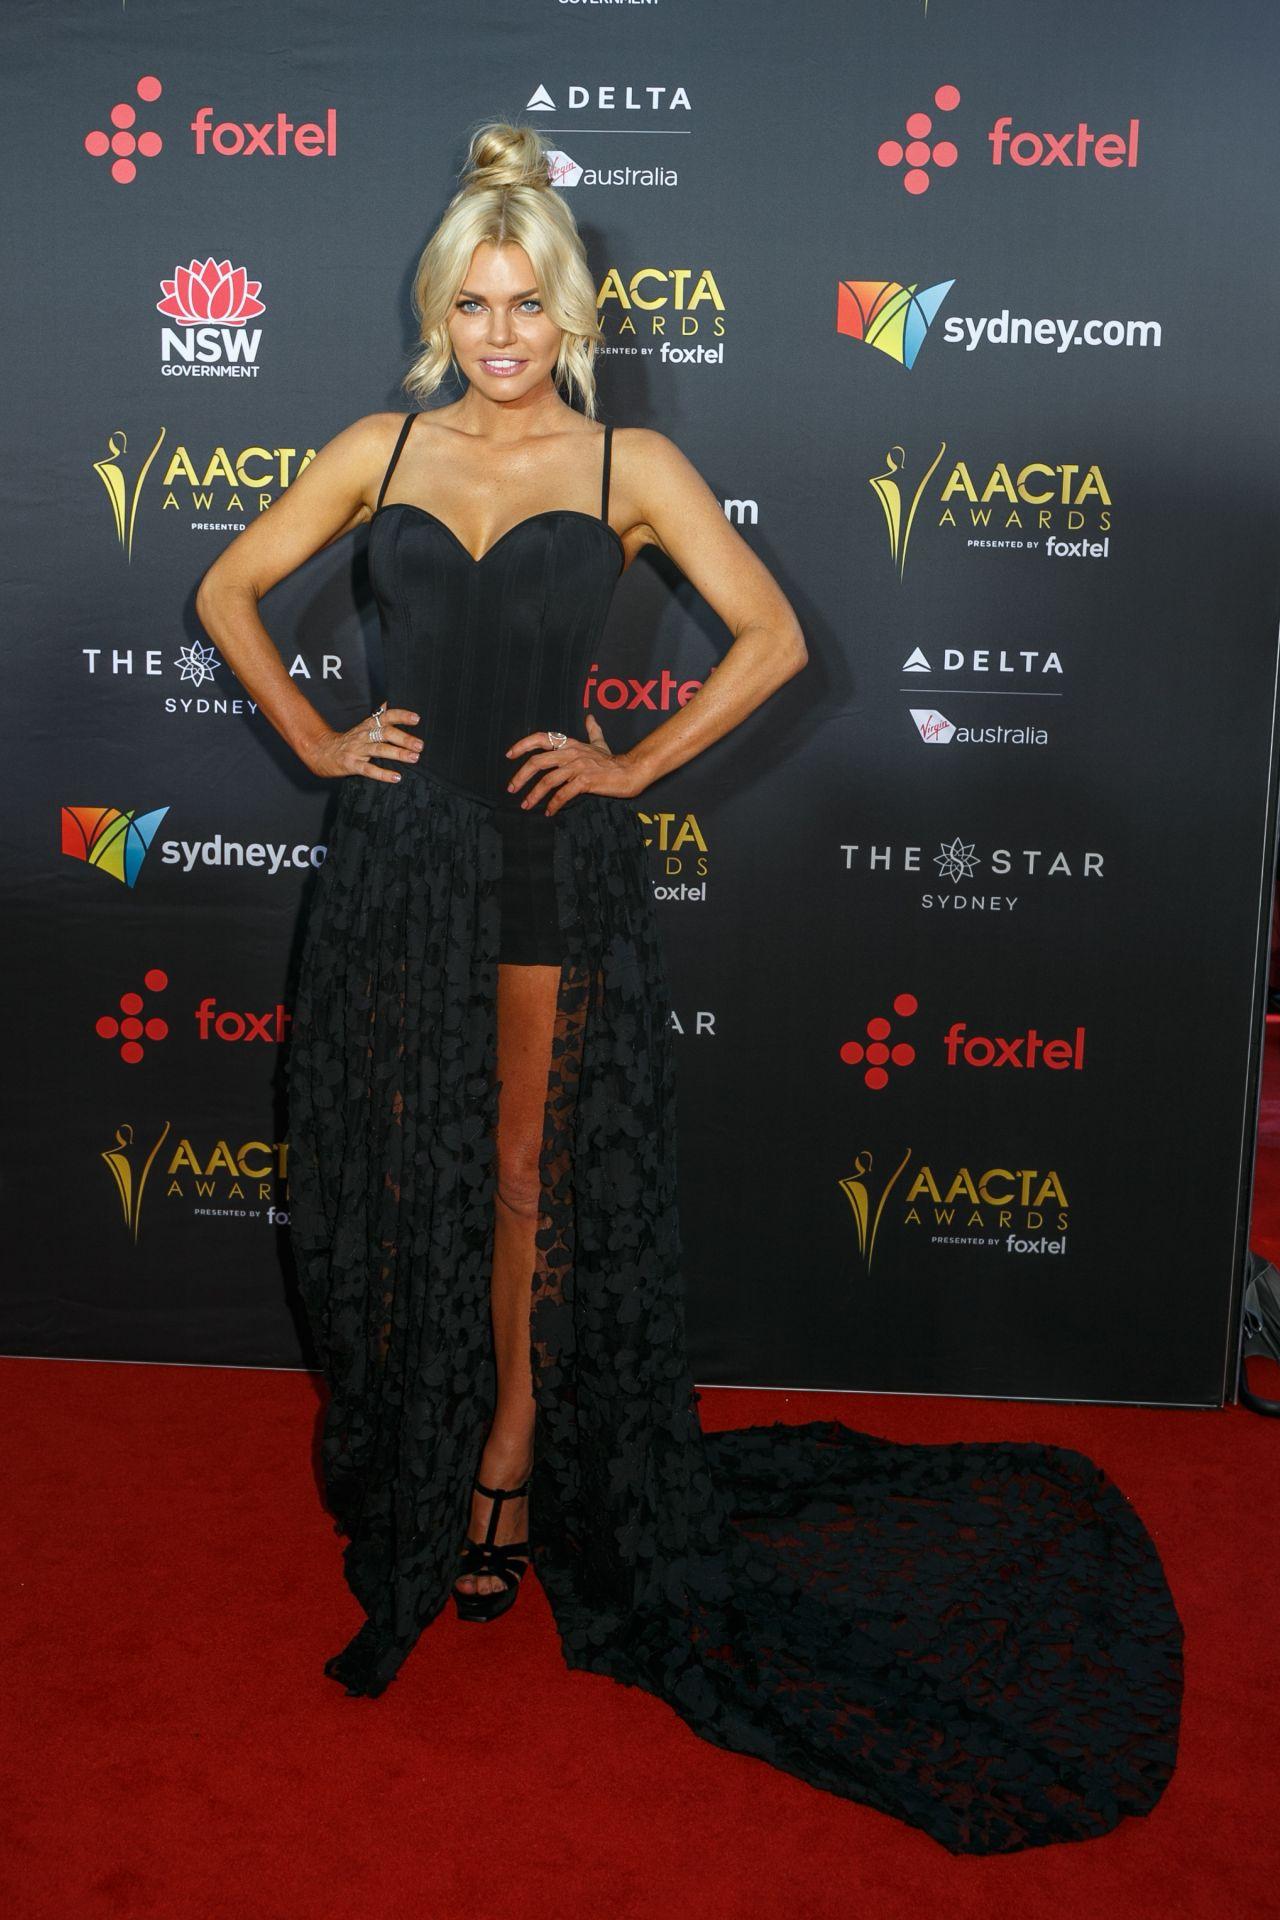 aacta awards - photo #25